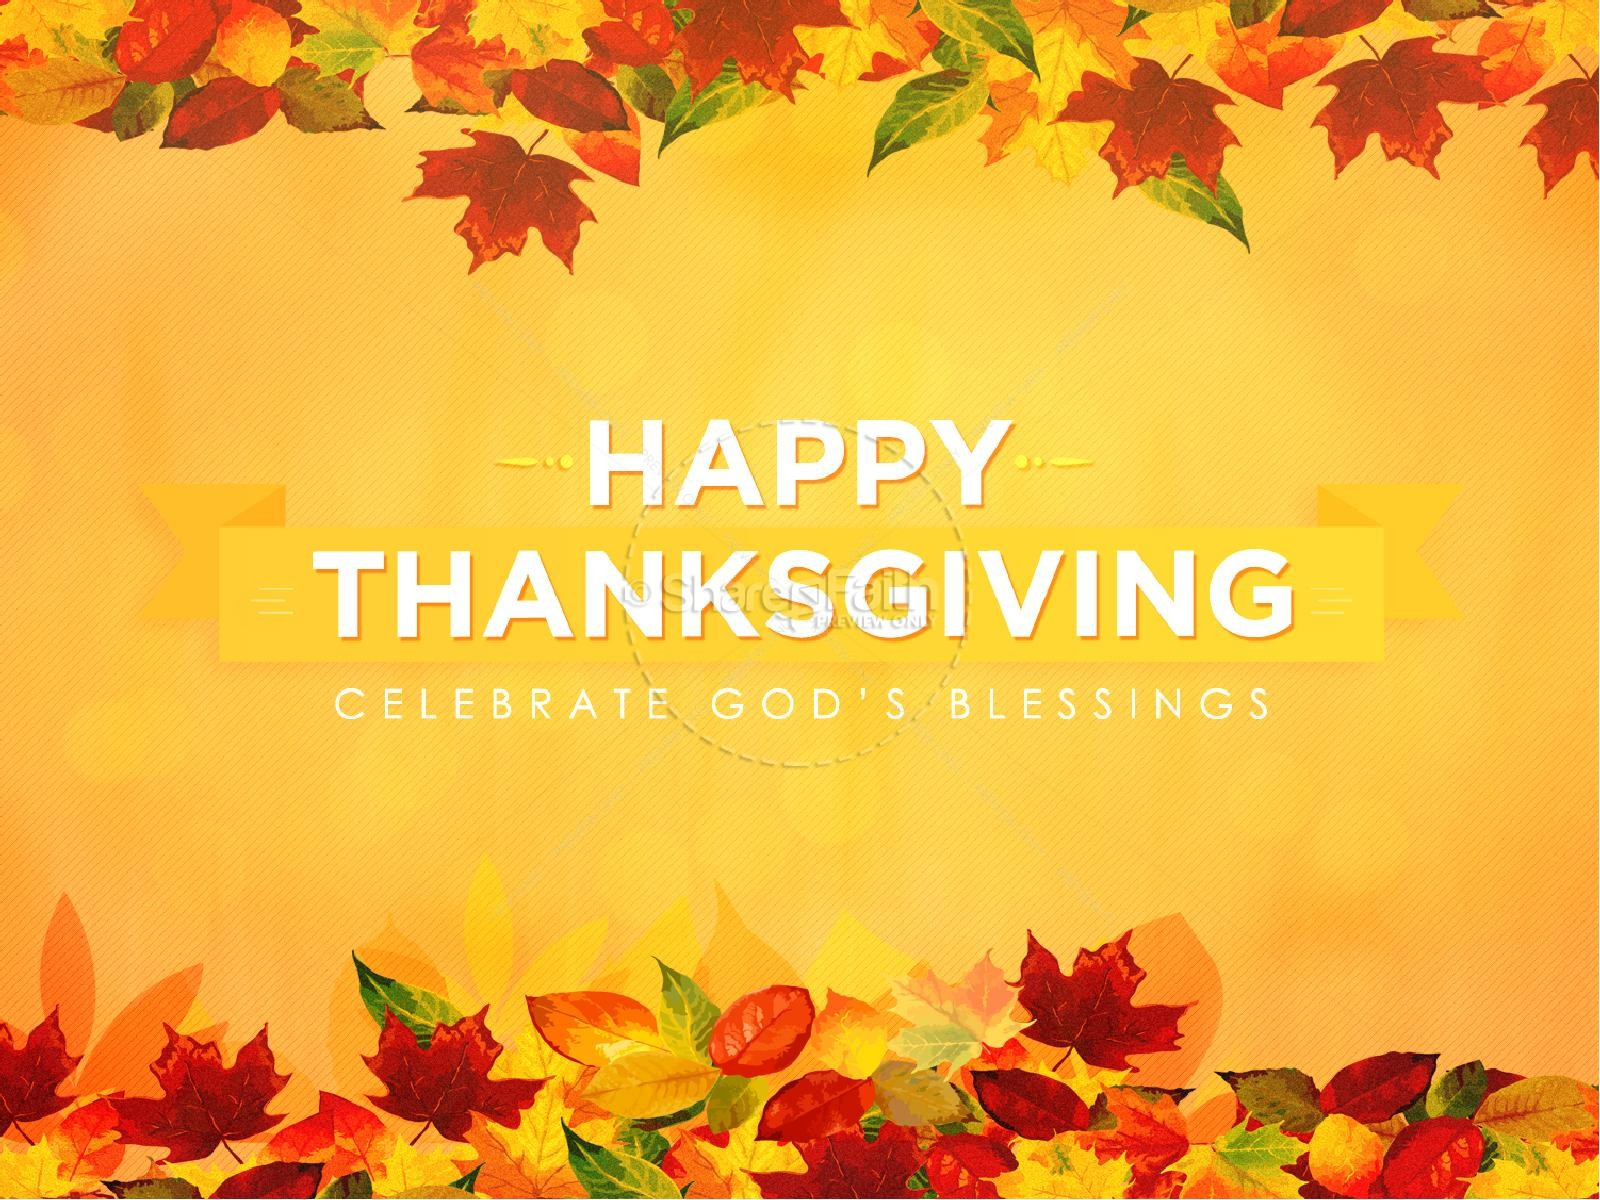 Happy Thanksgiving Blessings Wallpaper